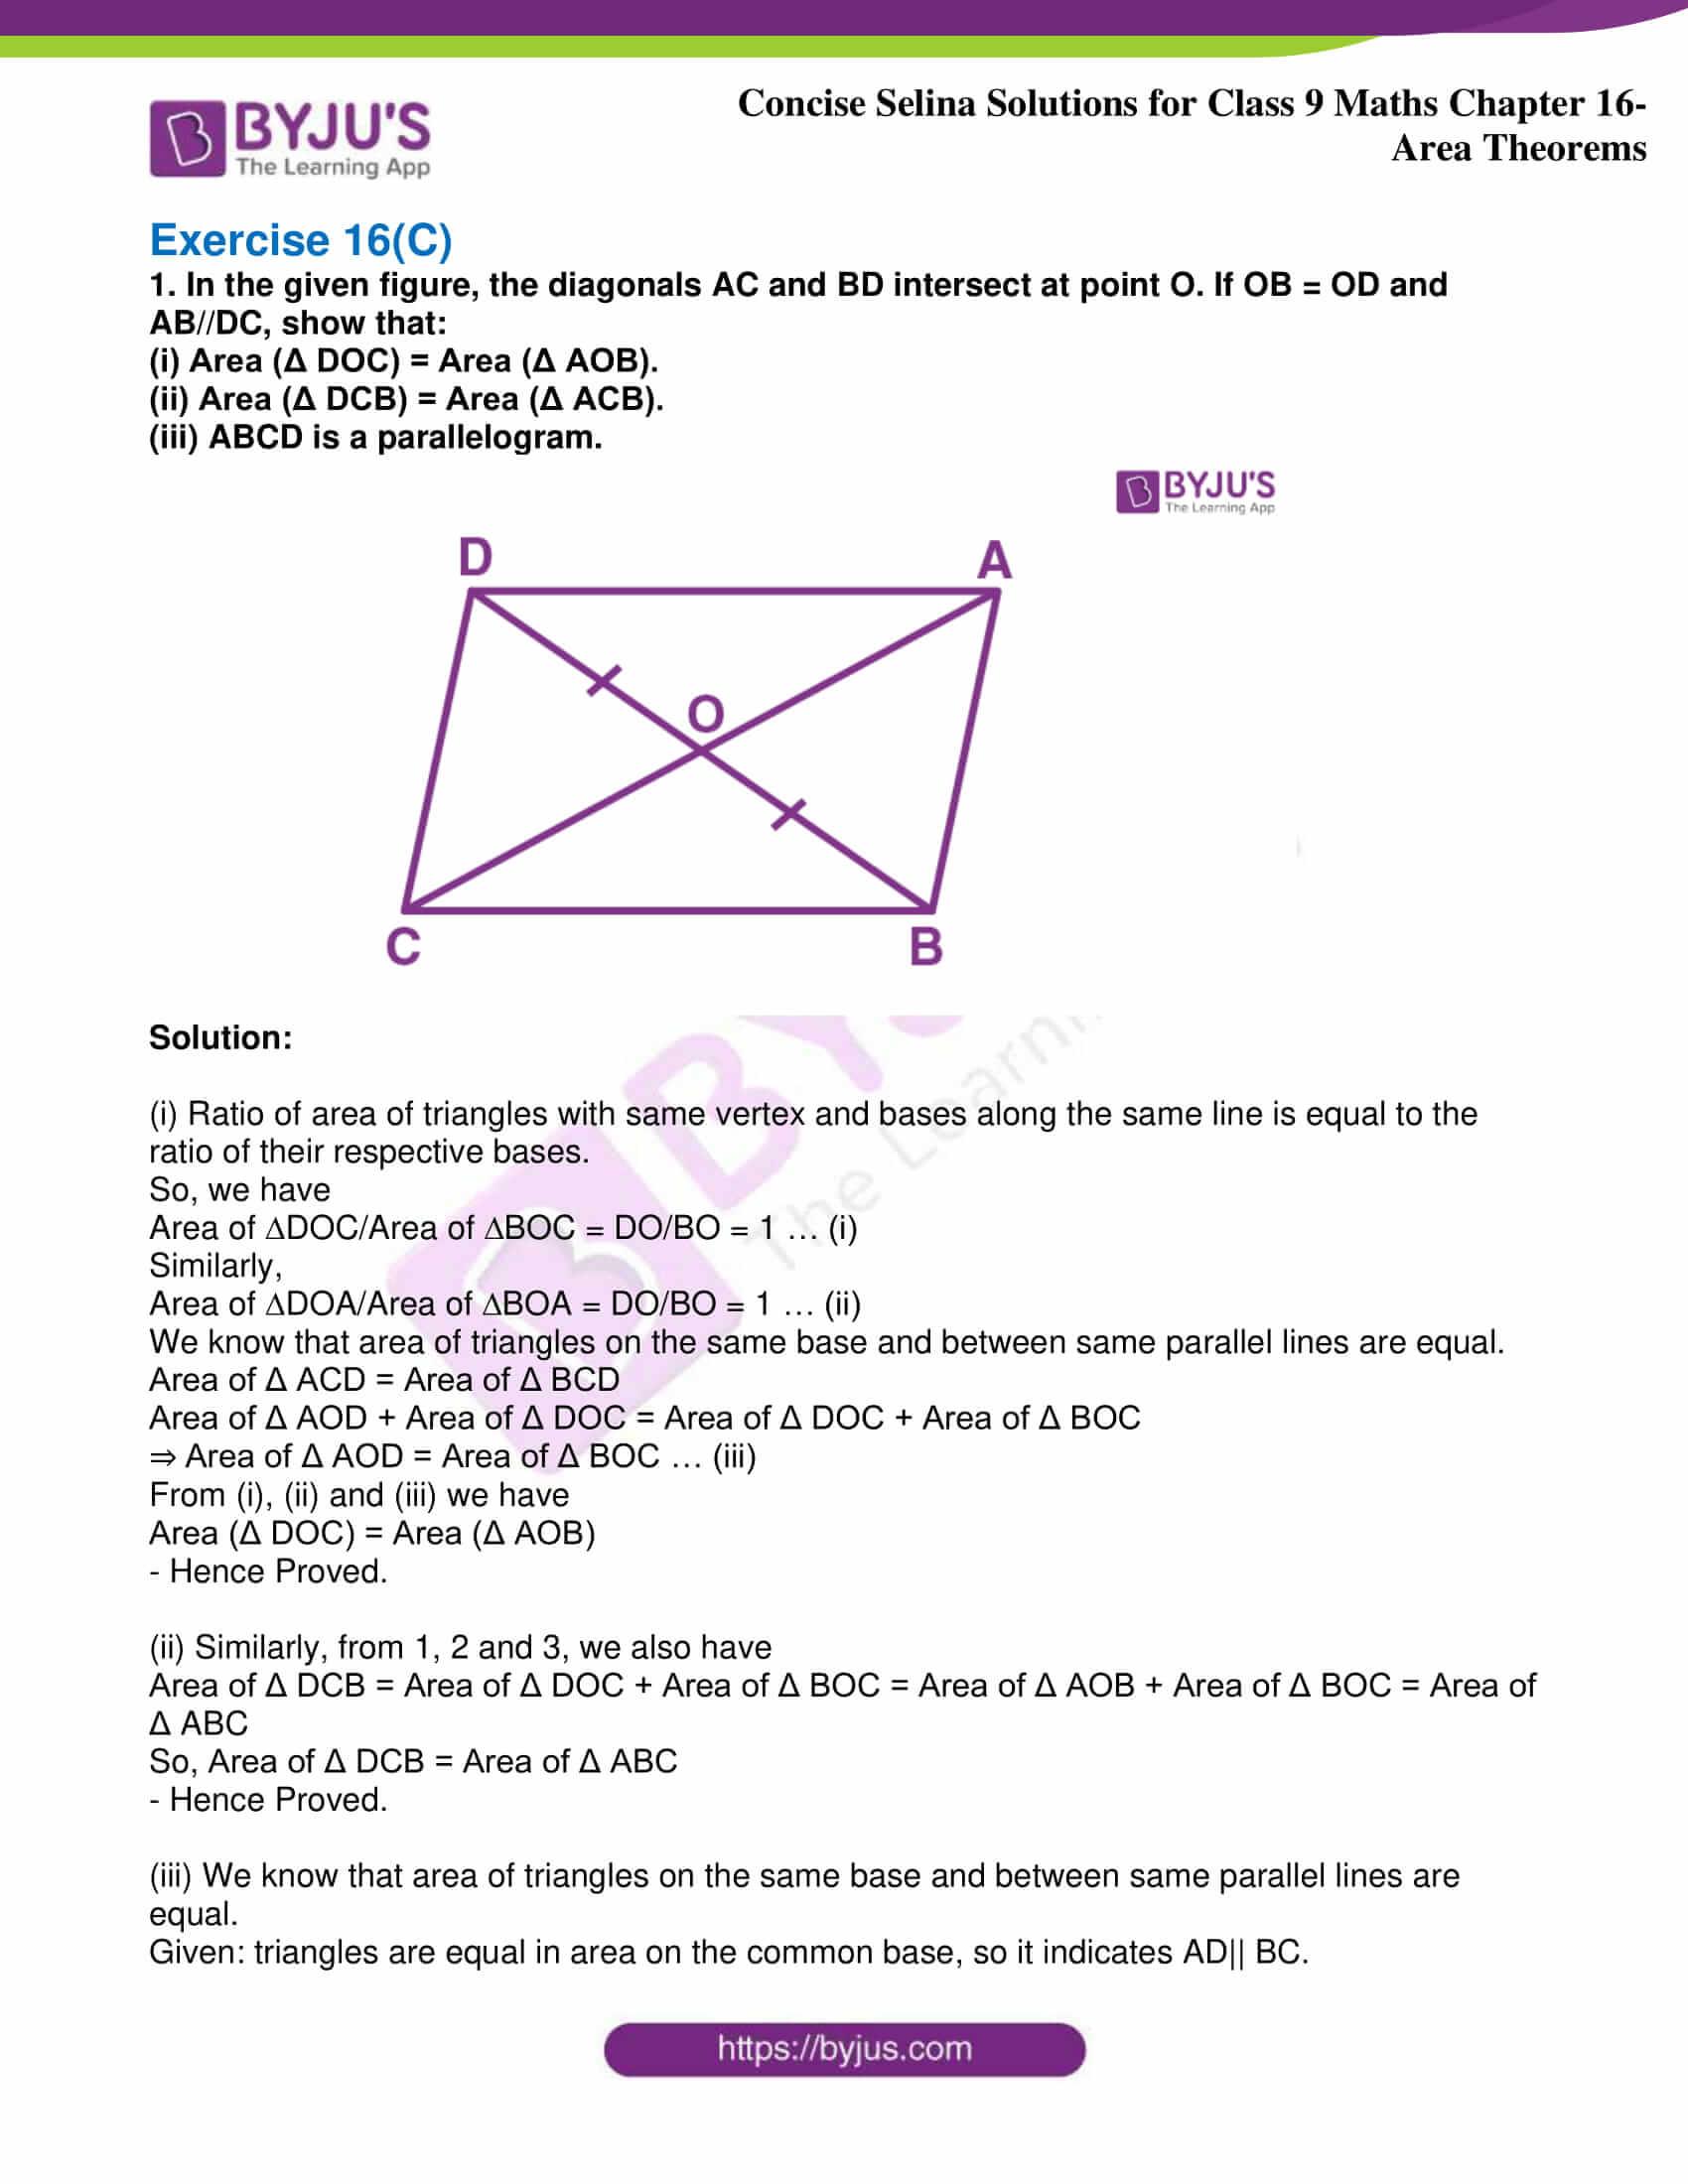 icse class 9 jun9 maths selina solutions chapter 16 area theorems 25